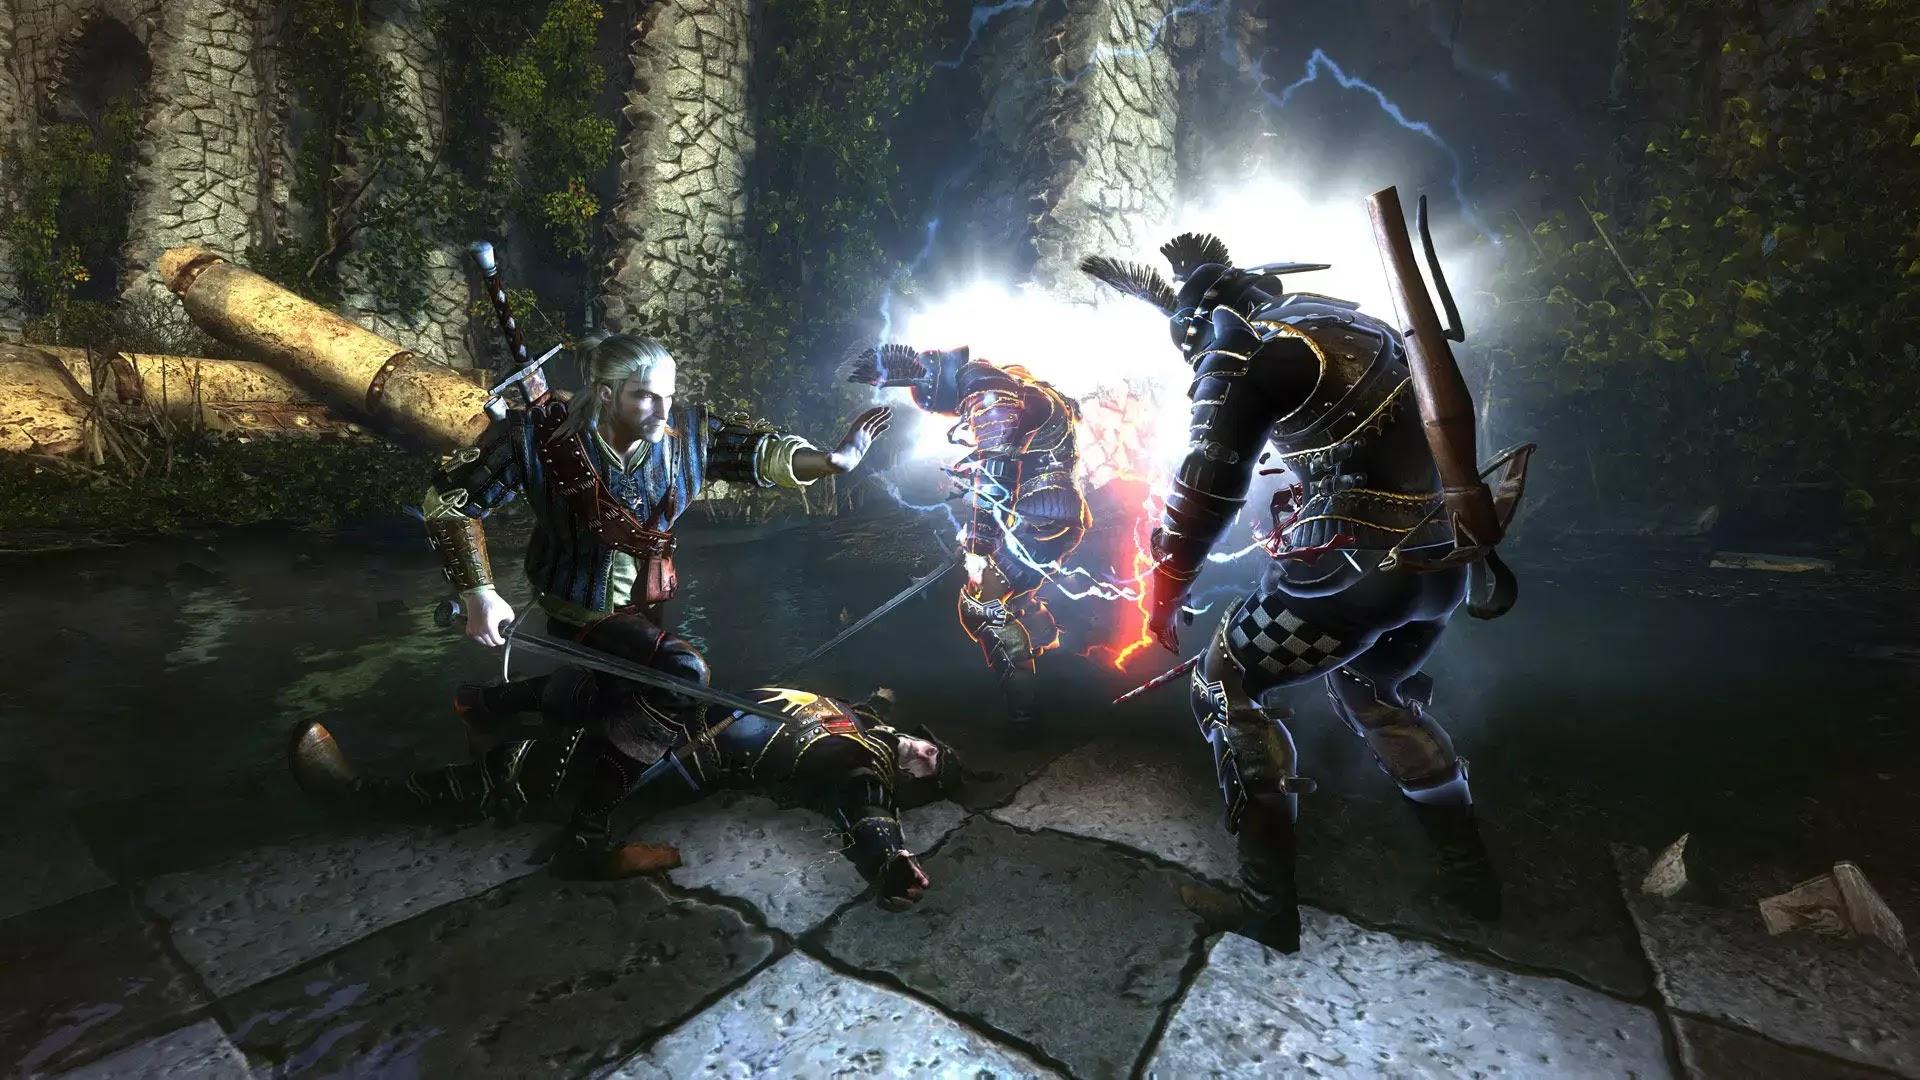 The Witcher 2 on Autumun Sale Steam 2020